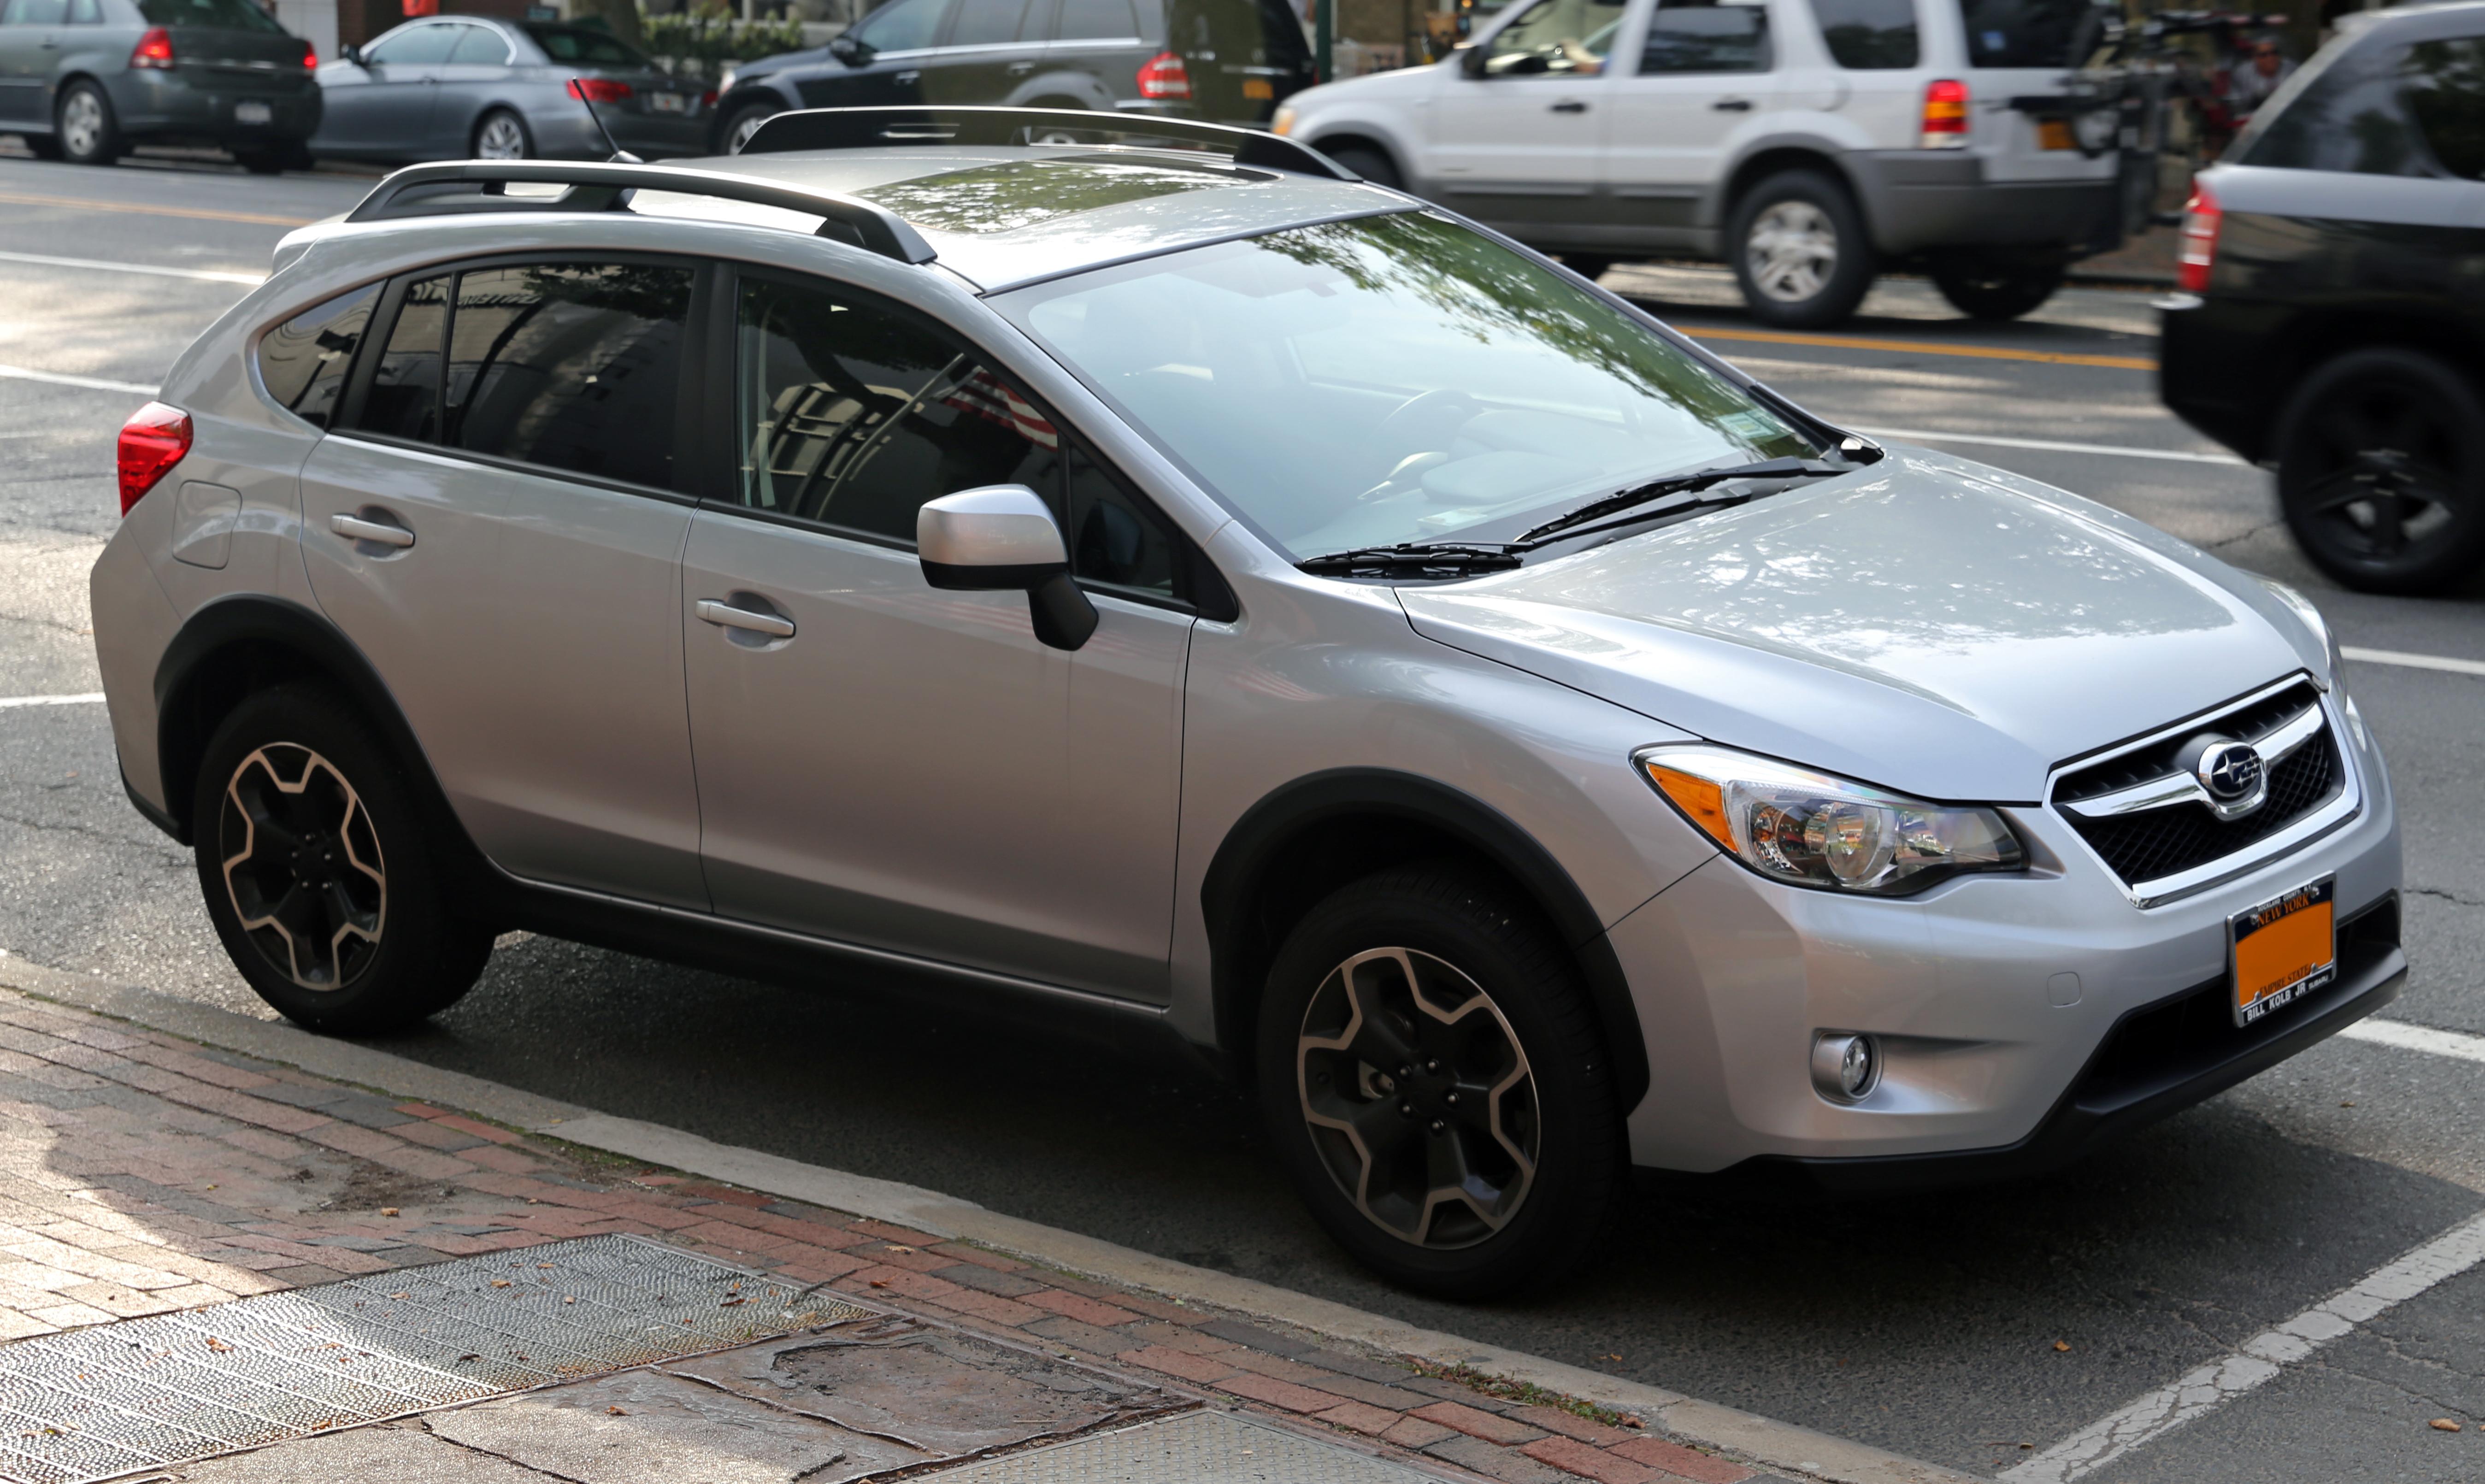 16045875431 additionally Sport Utility Vehicles moreover 67905906856119610 likewise 2018 Subaru Tribeca Redesign besides File 2013 Subaru XV Crosstrek  front left view. on subaruxv crosstrek